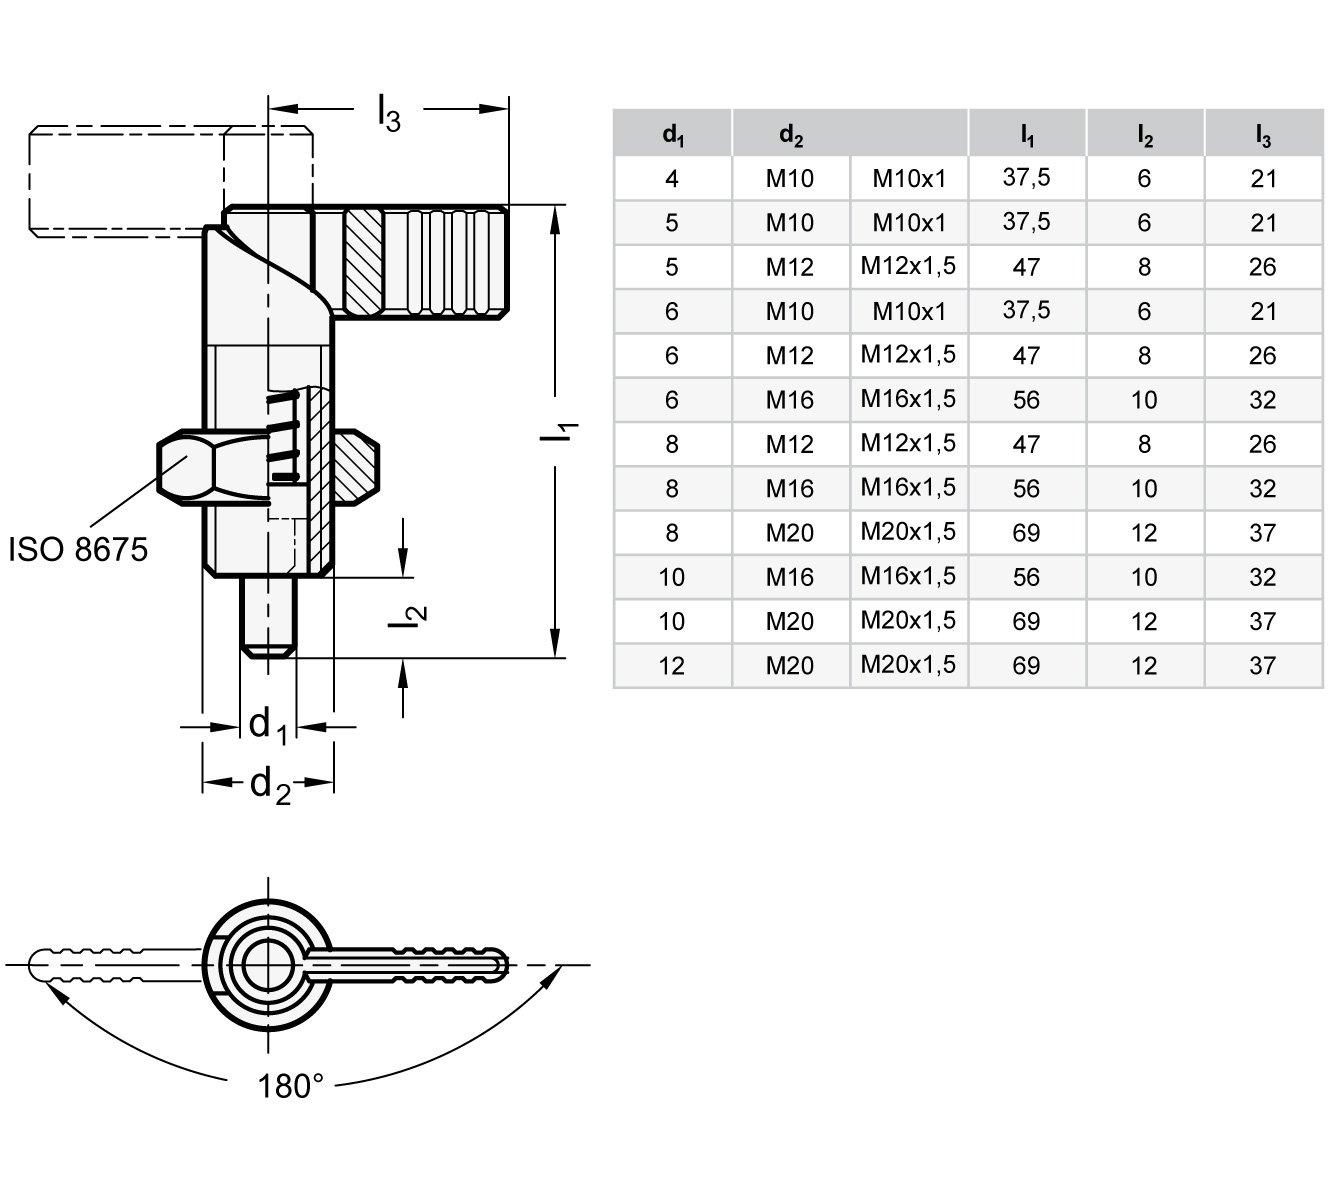 br/üniert Gewinde d2 Ganter Normelemente GN 612-12-M20-AK 612-12-M20-AK-Rastriegel M20